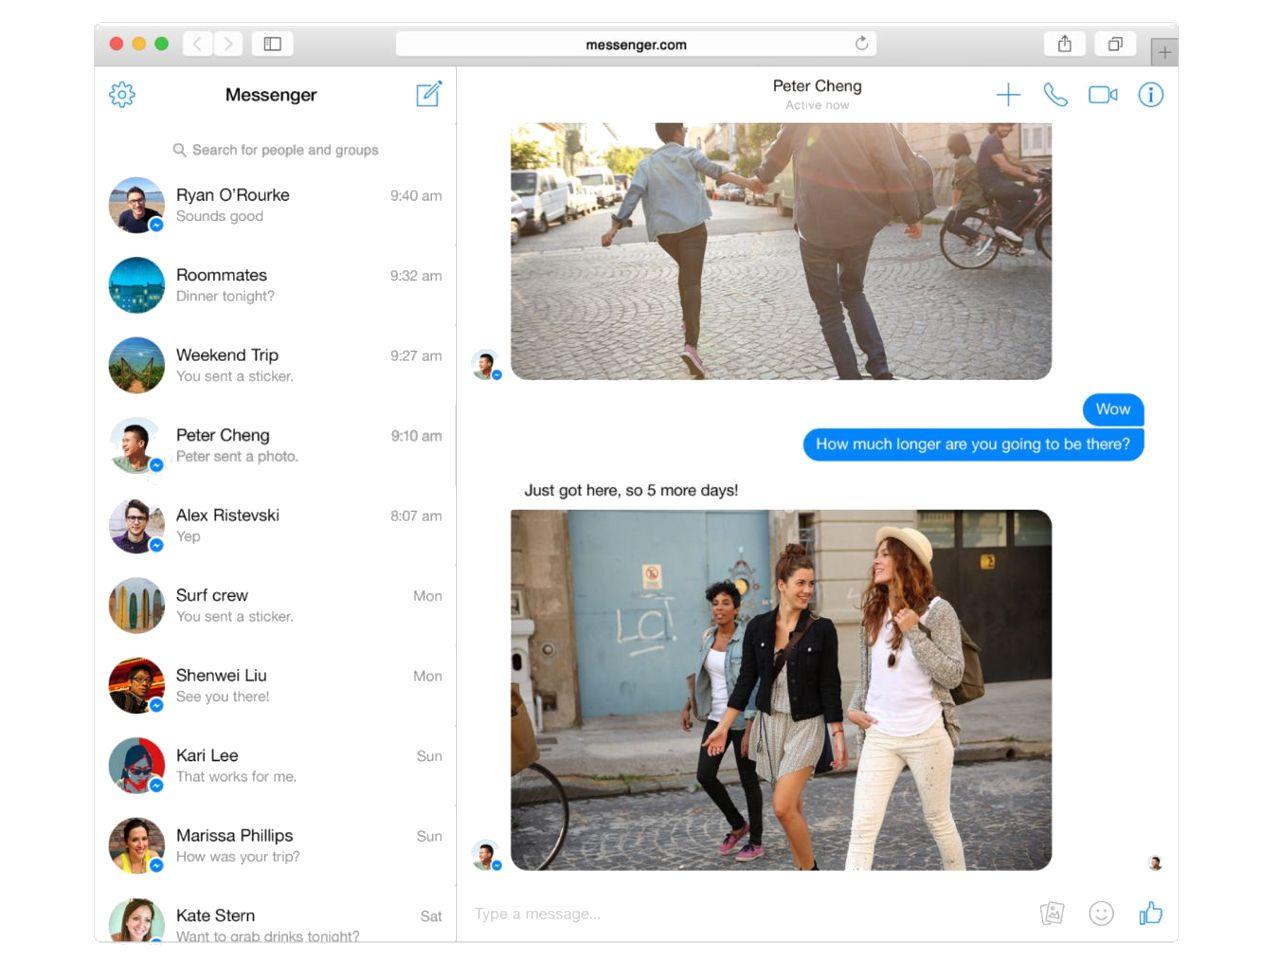 Messenger for web screenshot. Credit: Facebook